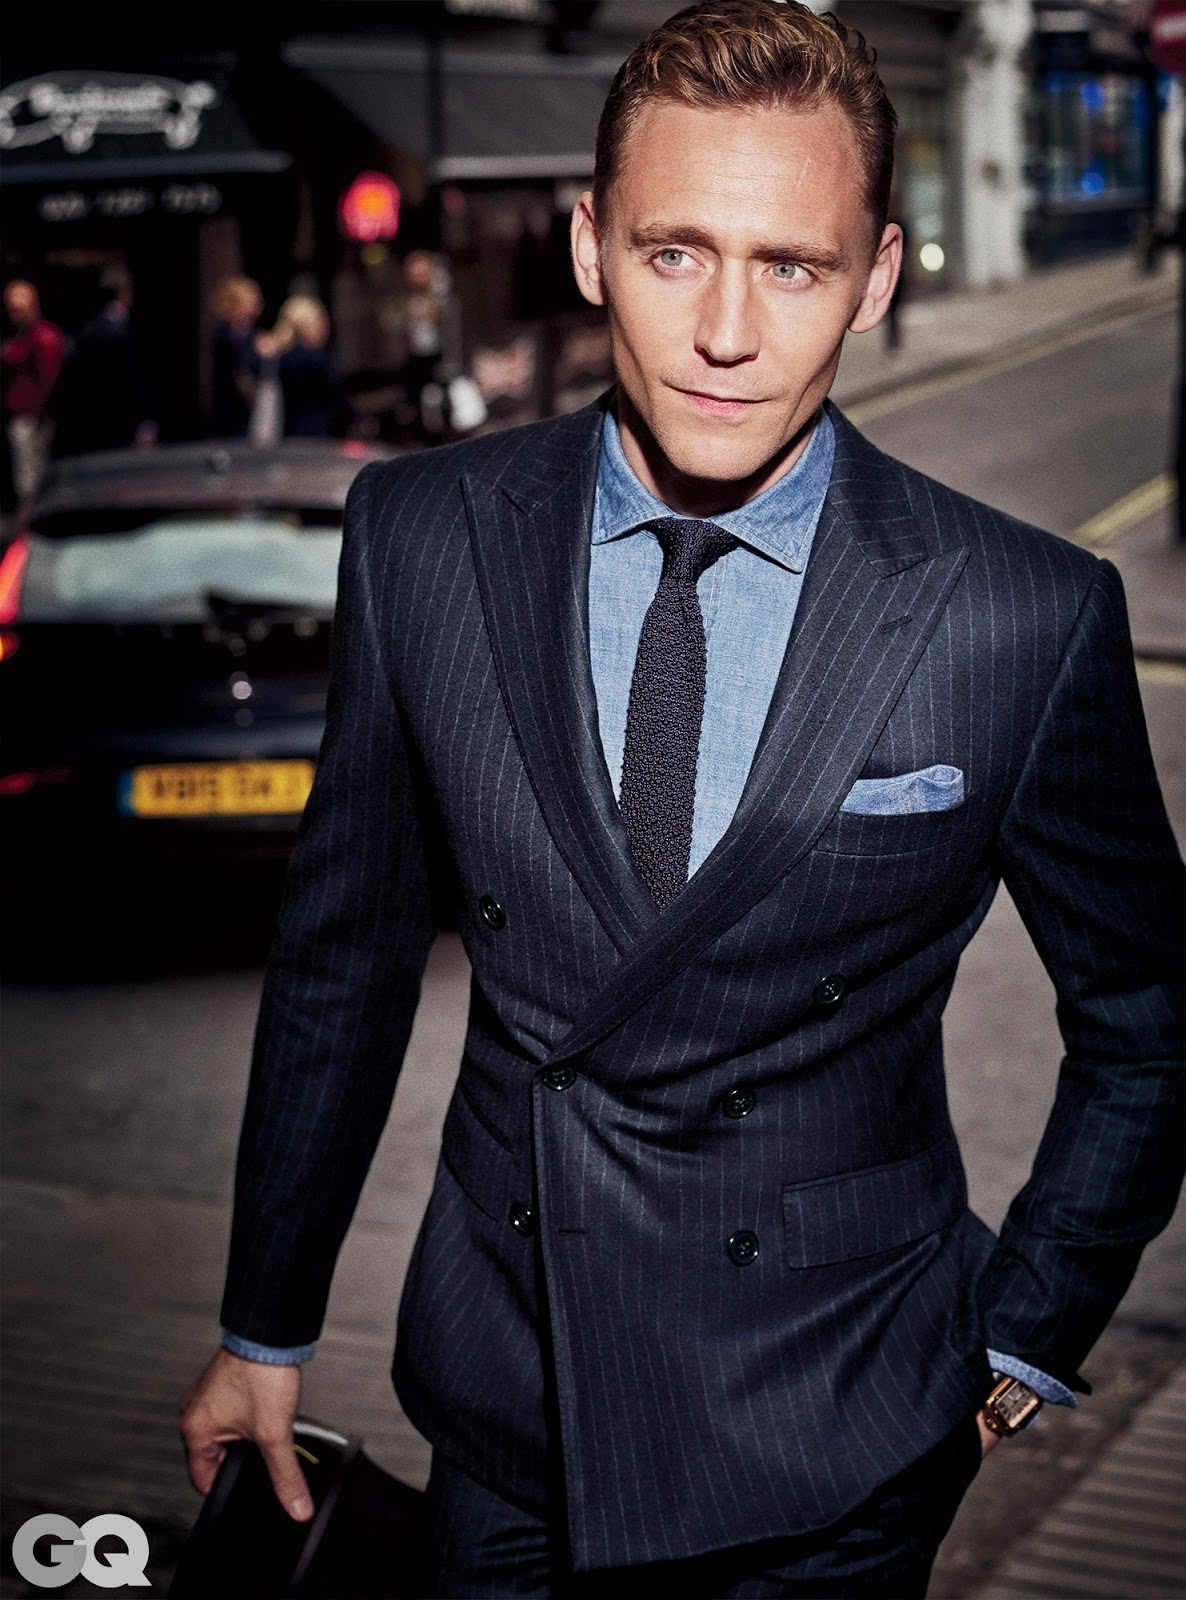 bc41a543b8d76 Tom Hiddleston Fashion  GQ Magazine  Sharpest Suits of the Season (2015)